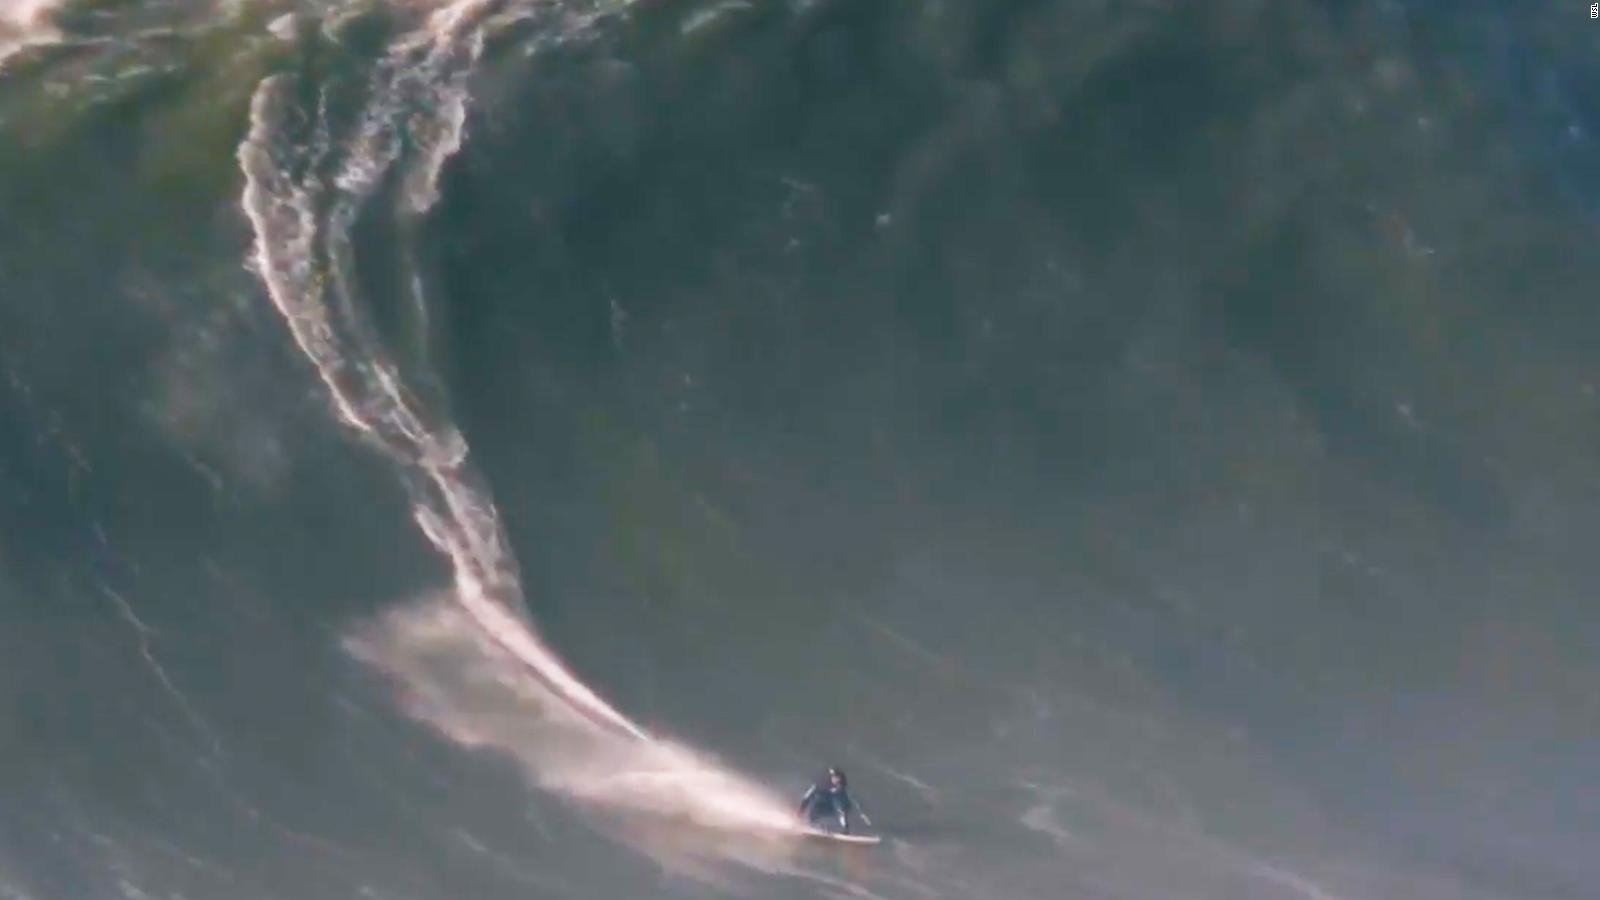 Brazilian Surfer Rodrigo Koxa Surfs World Record 80 Foot Wave In